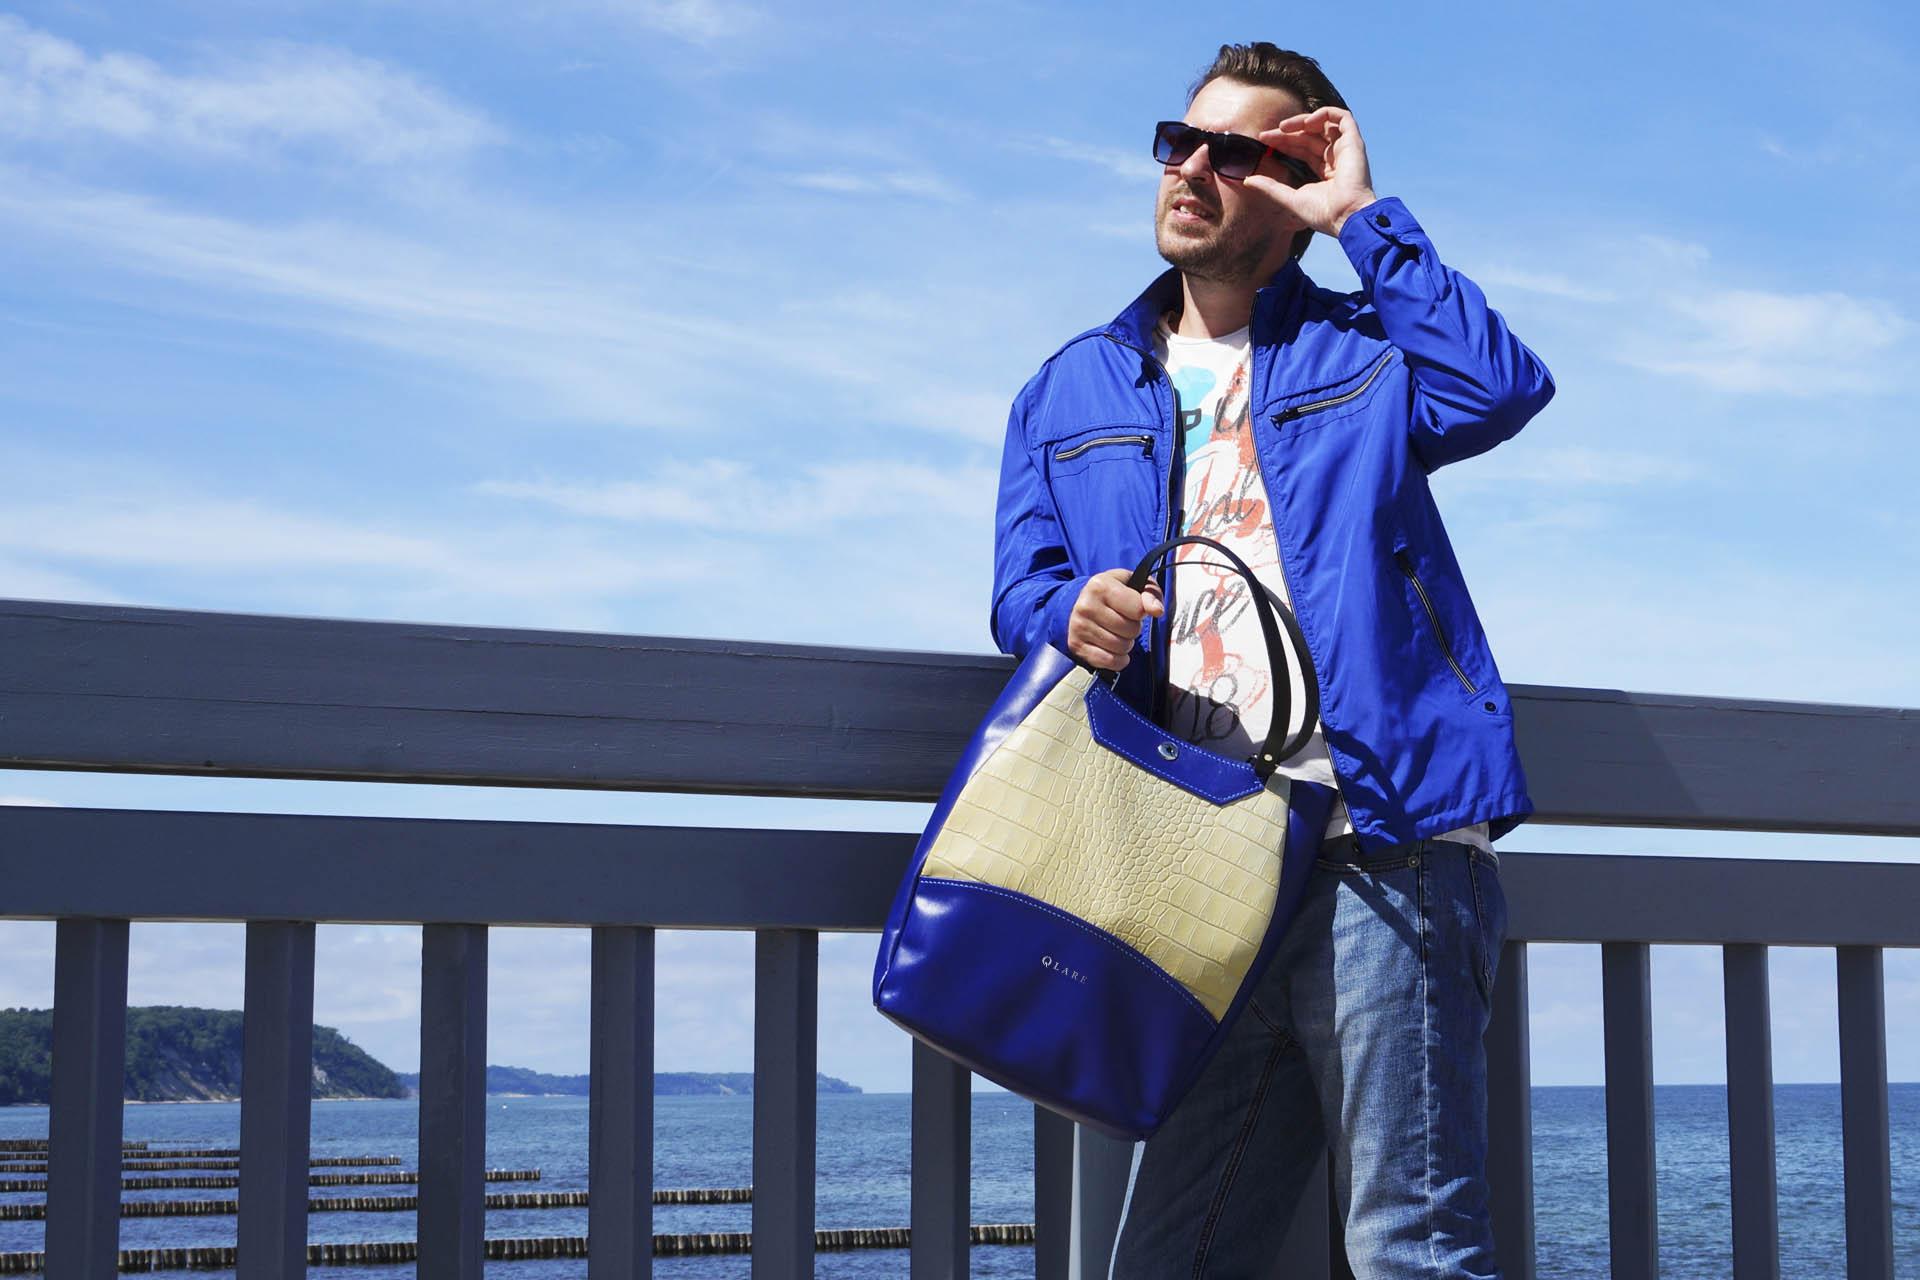 fashion exclusive bag for men 2021